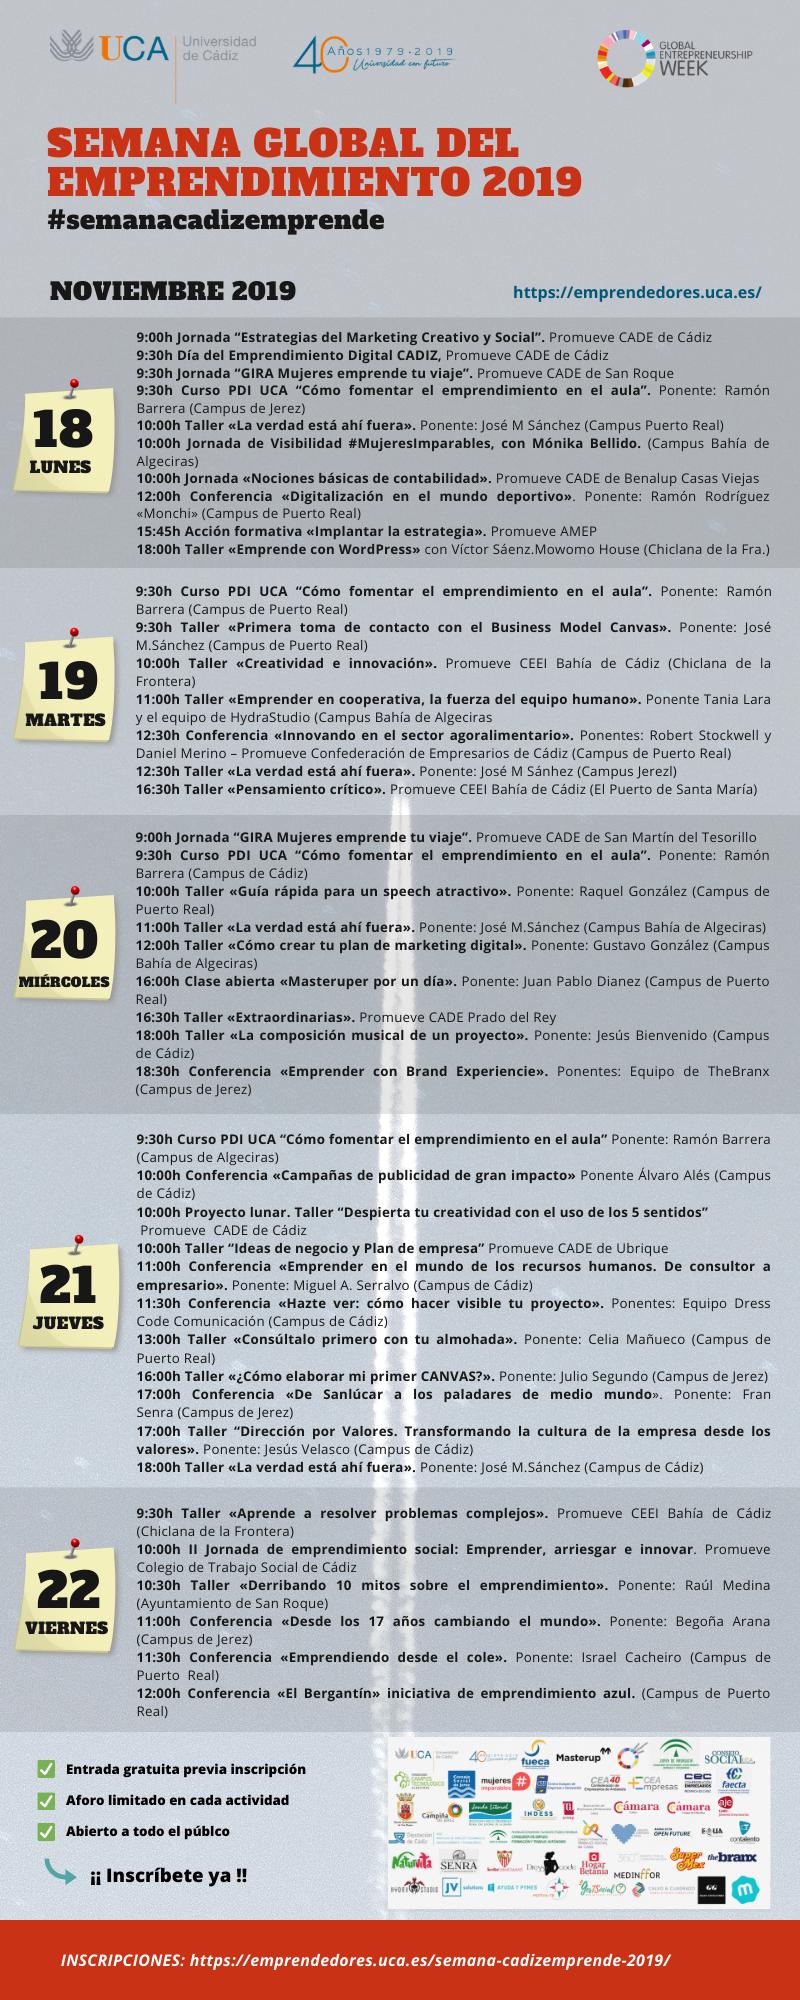 Programa #semanacadizemprende